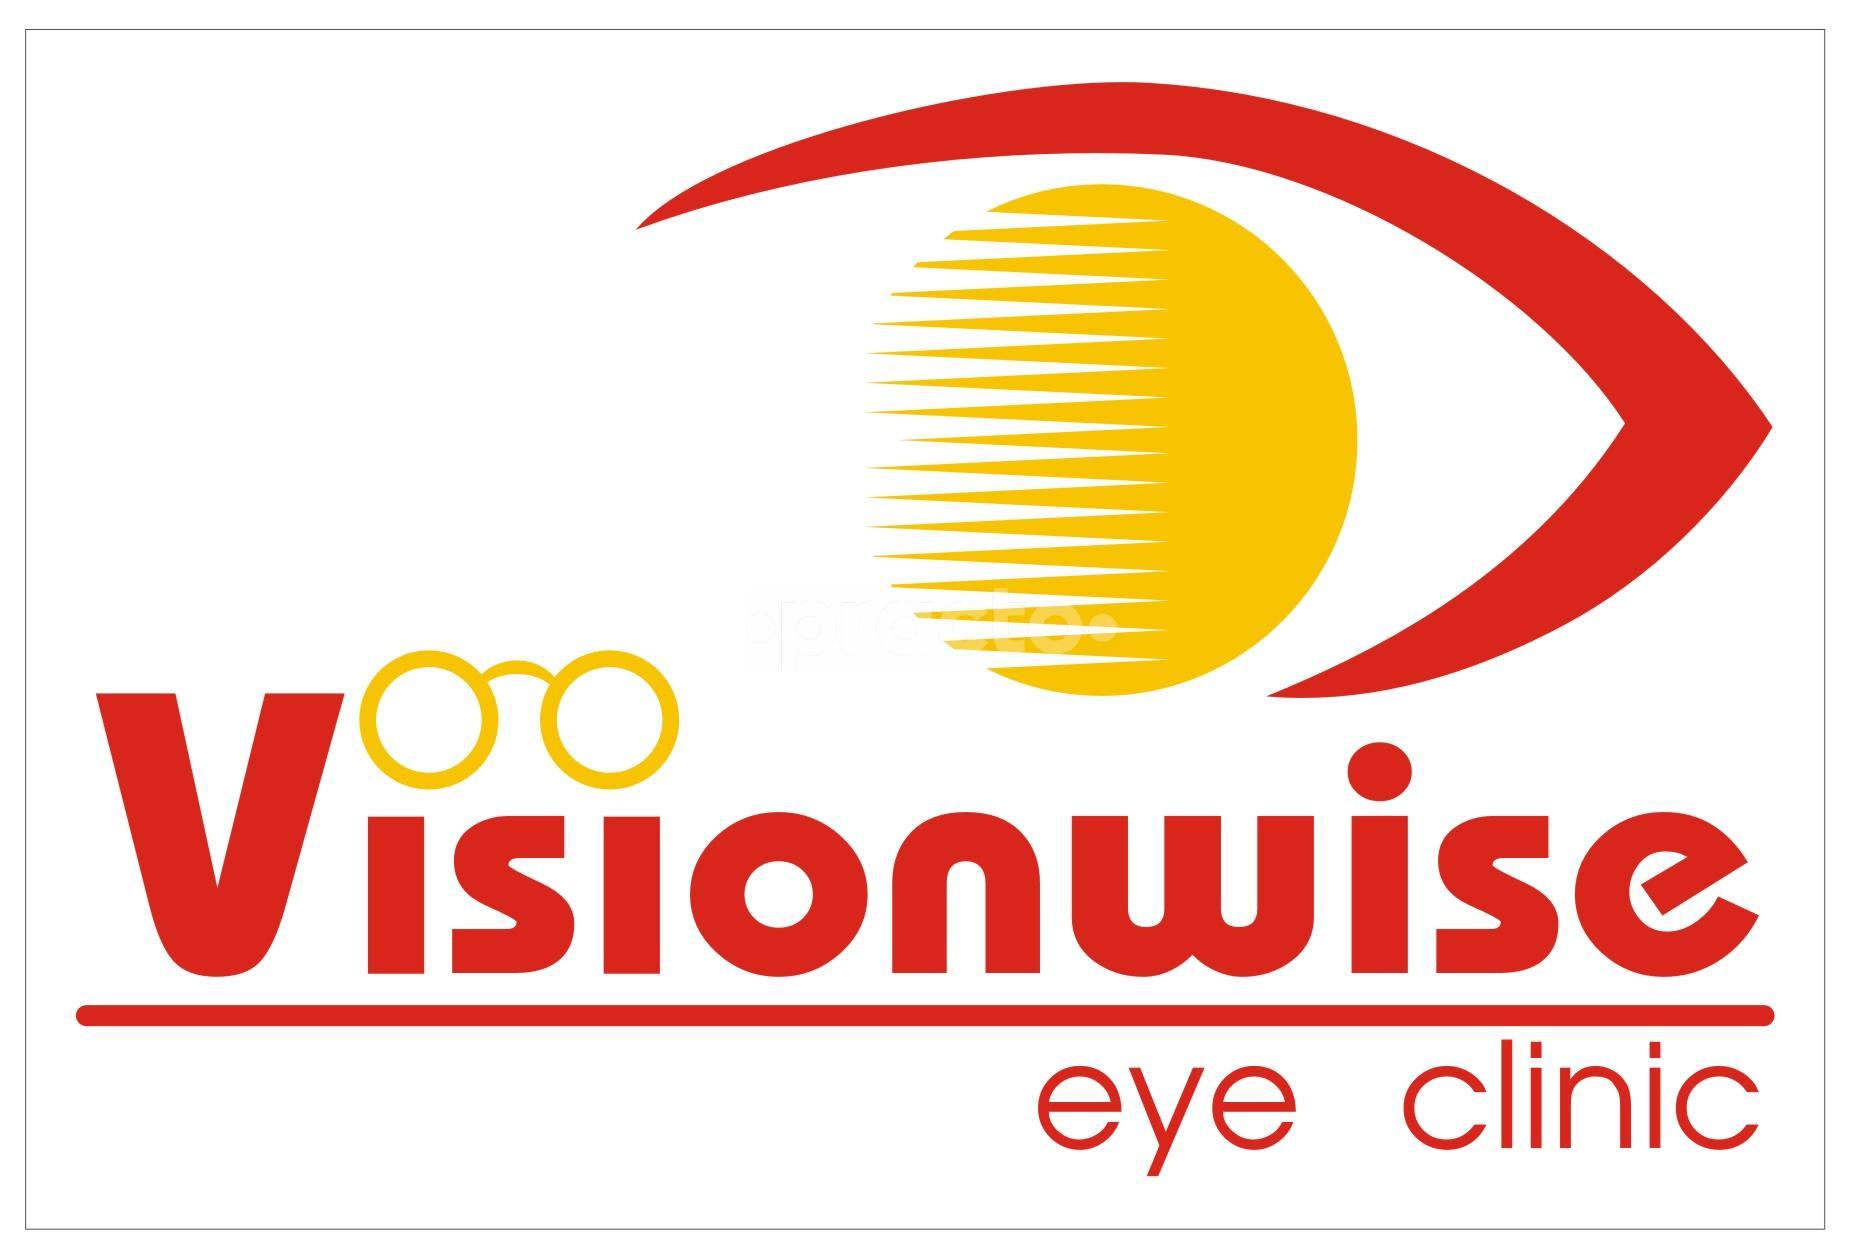 Visionwise Eye Clinic